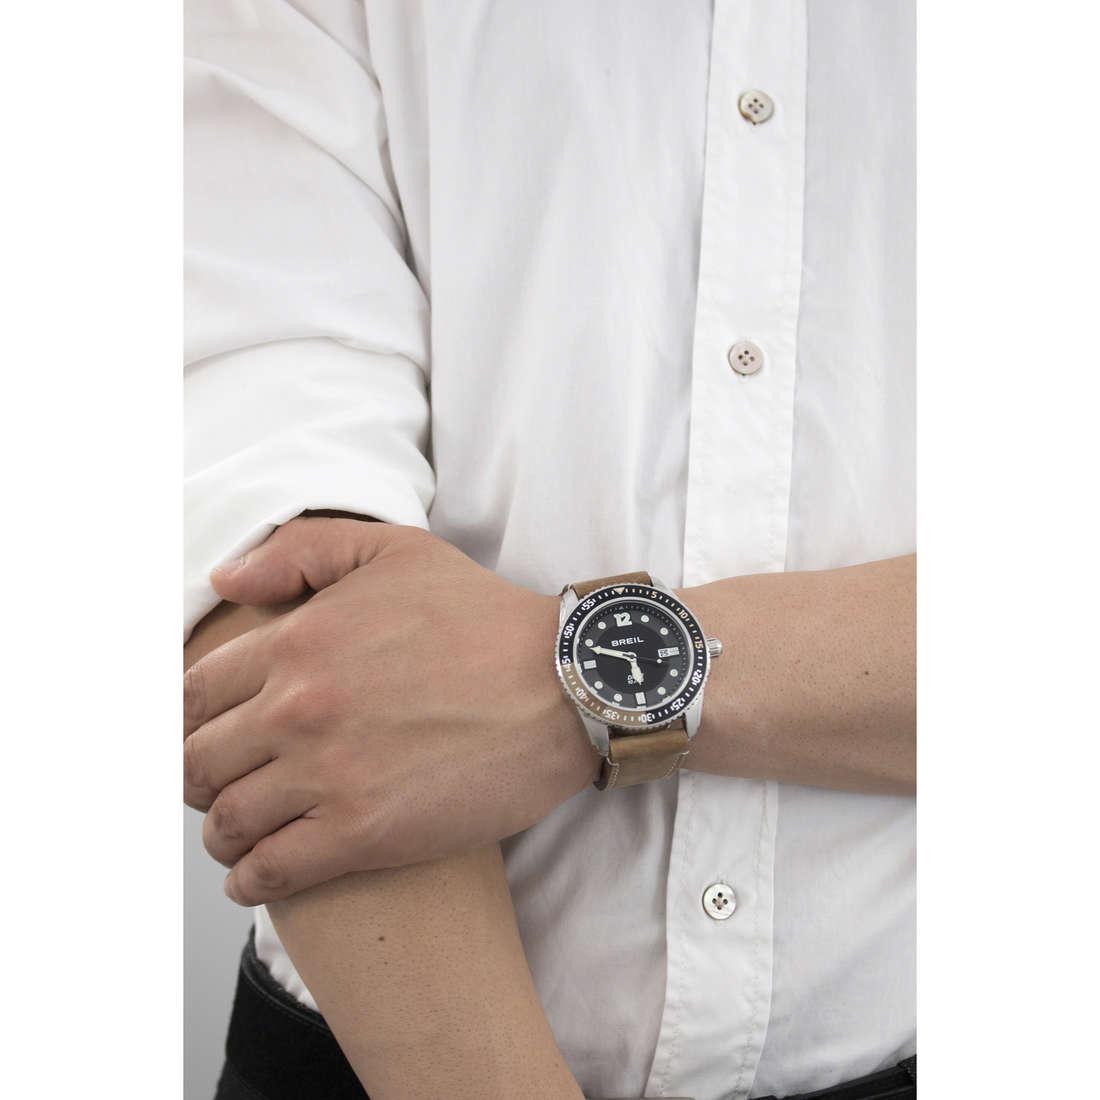 Breil solo tempo Oceano uomo TW1422 indosso